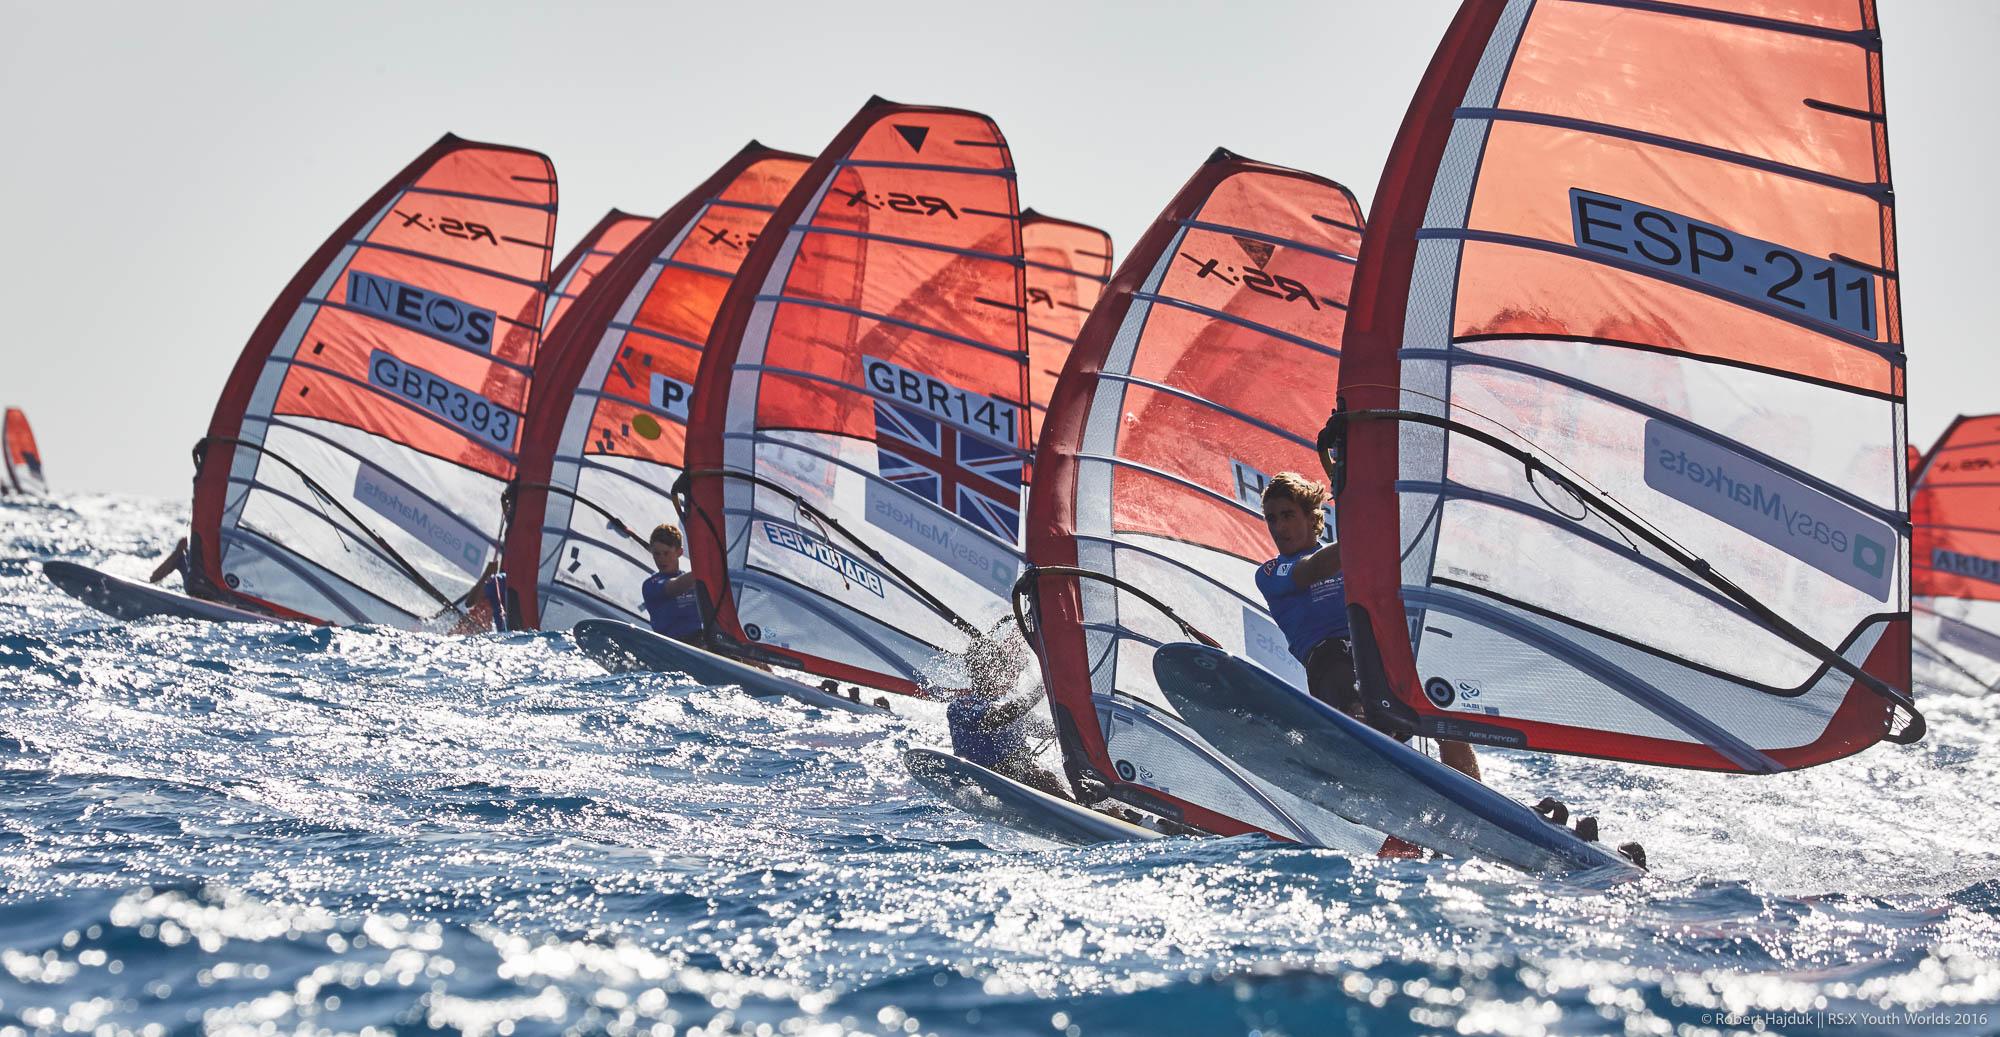 RS:X Youth World Championship || 2016-11-21, Limassol, Cyprus || © Copyright 2016 || Robert Hajduk - ShutterSail.com || All Rights Reserved ||